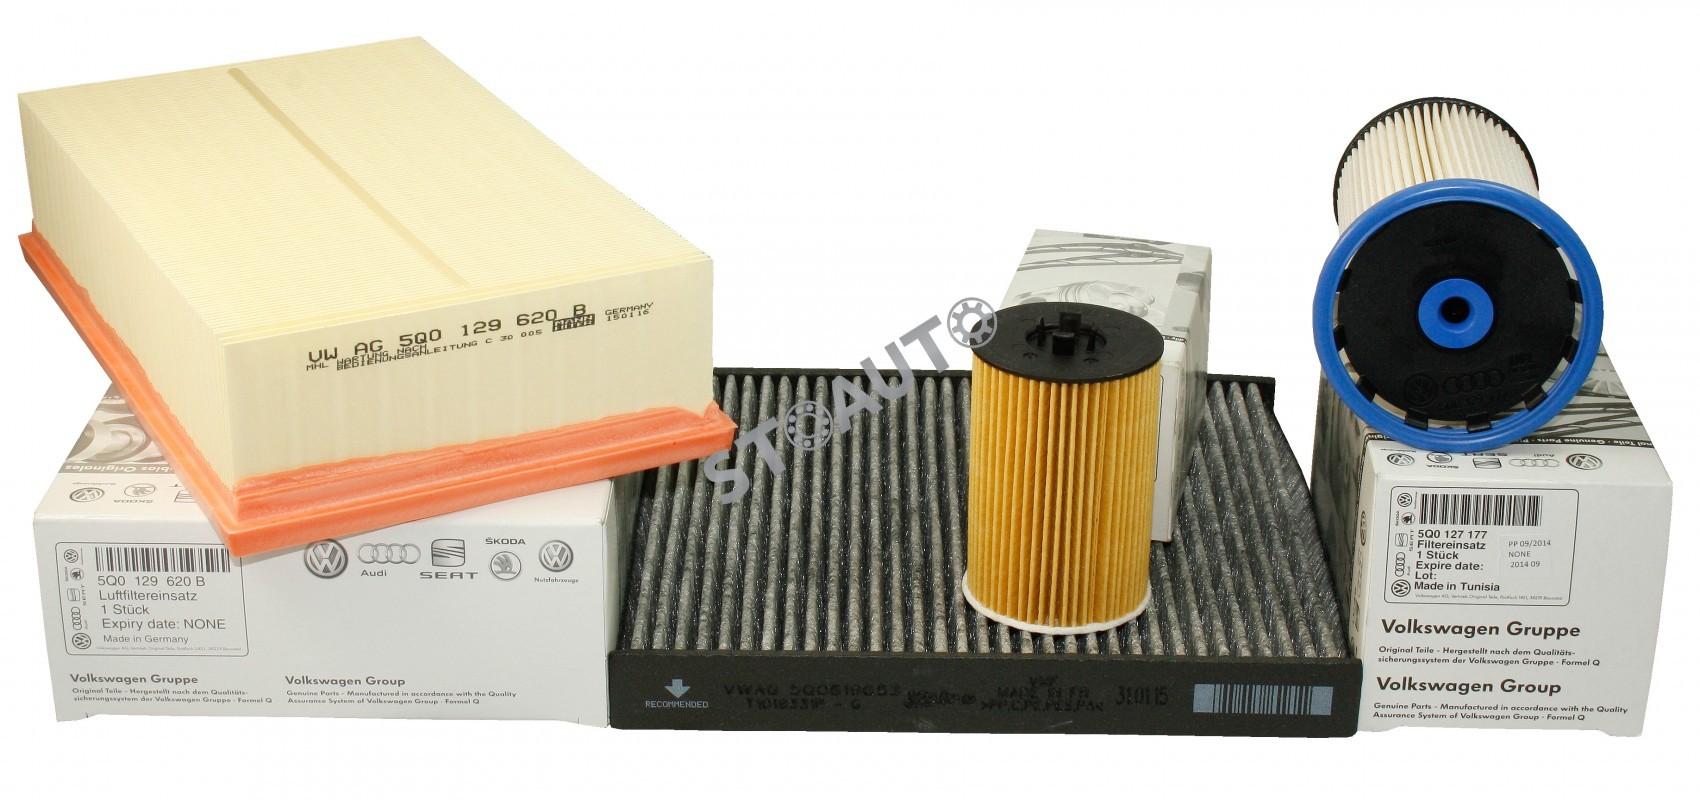 PB82.0TDI150OE Set filtre revizie originale VW Passat B8 2.0 TDI 150 cai OE